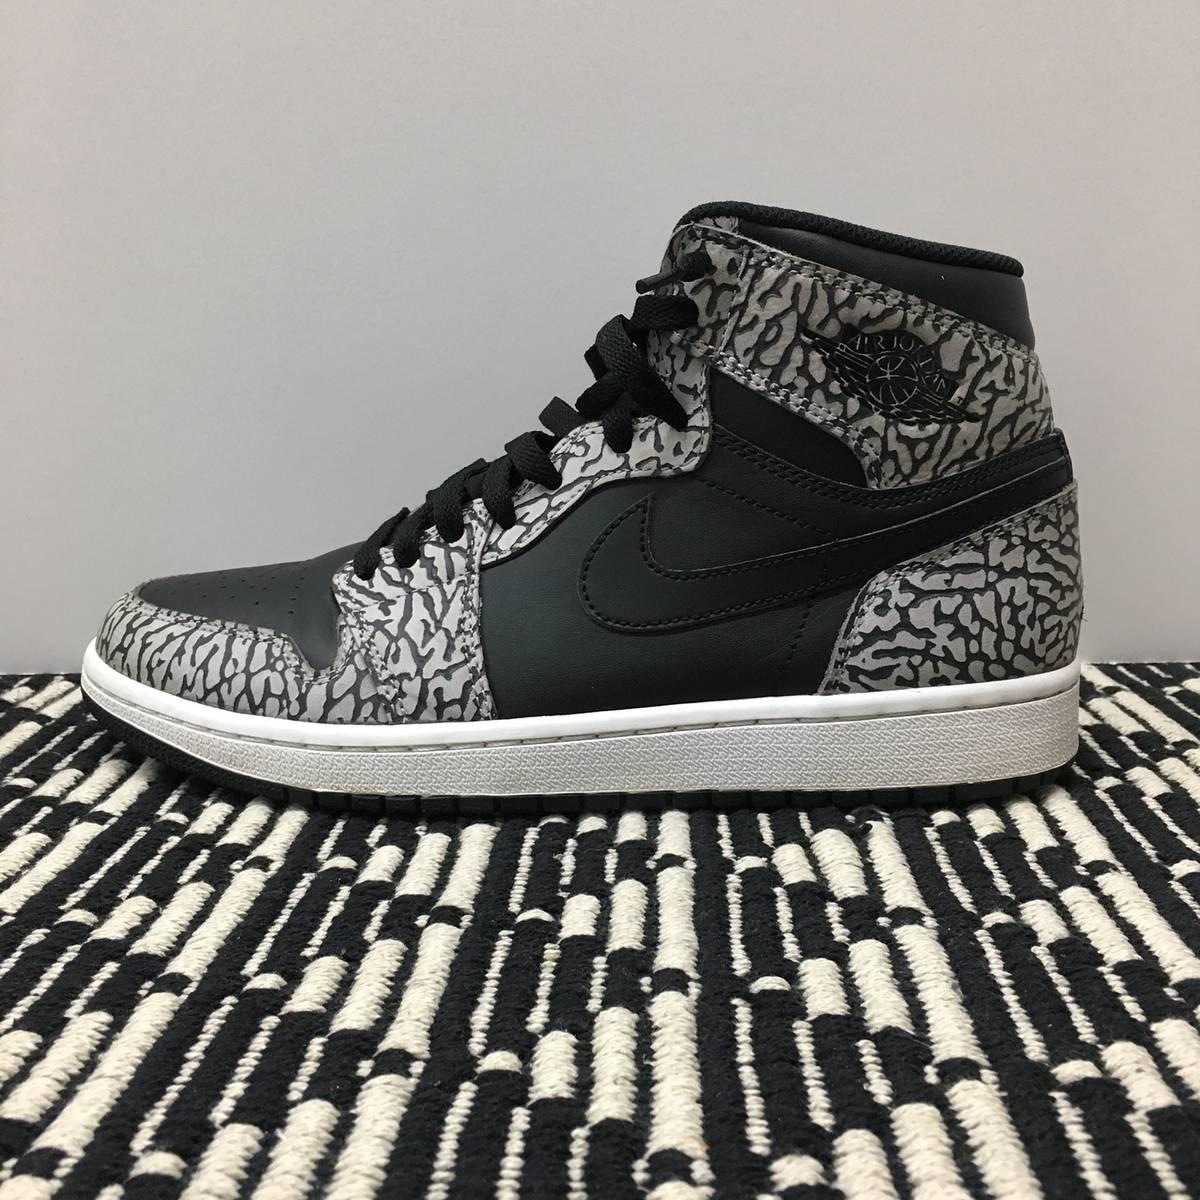 c6005d866a8c Nike Air Jordan 1 Elephant Print Size 8.5 - Hi-Top Sneakers for Sale ...